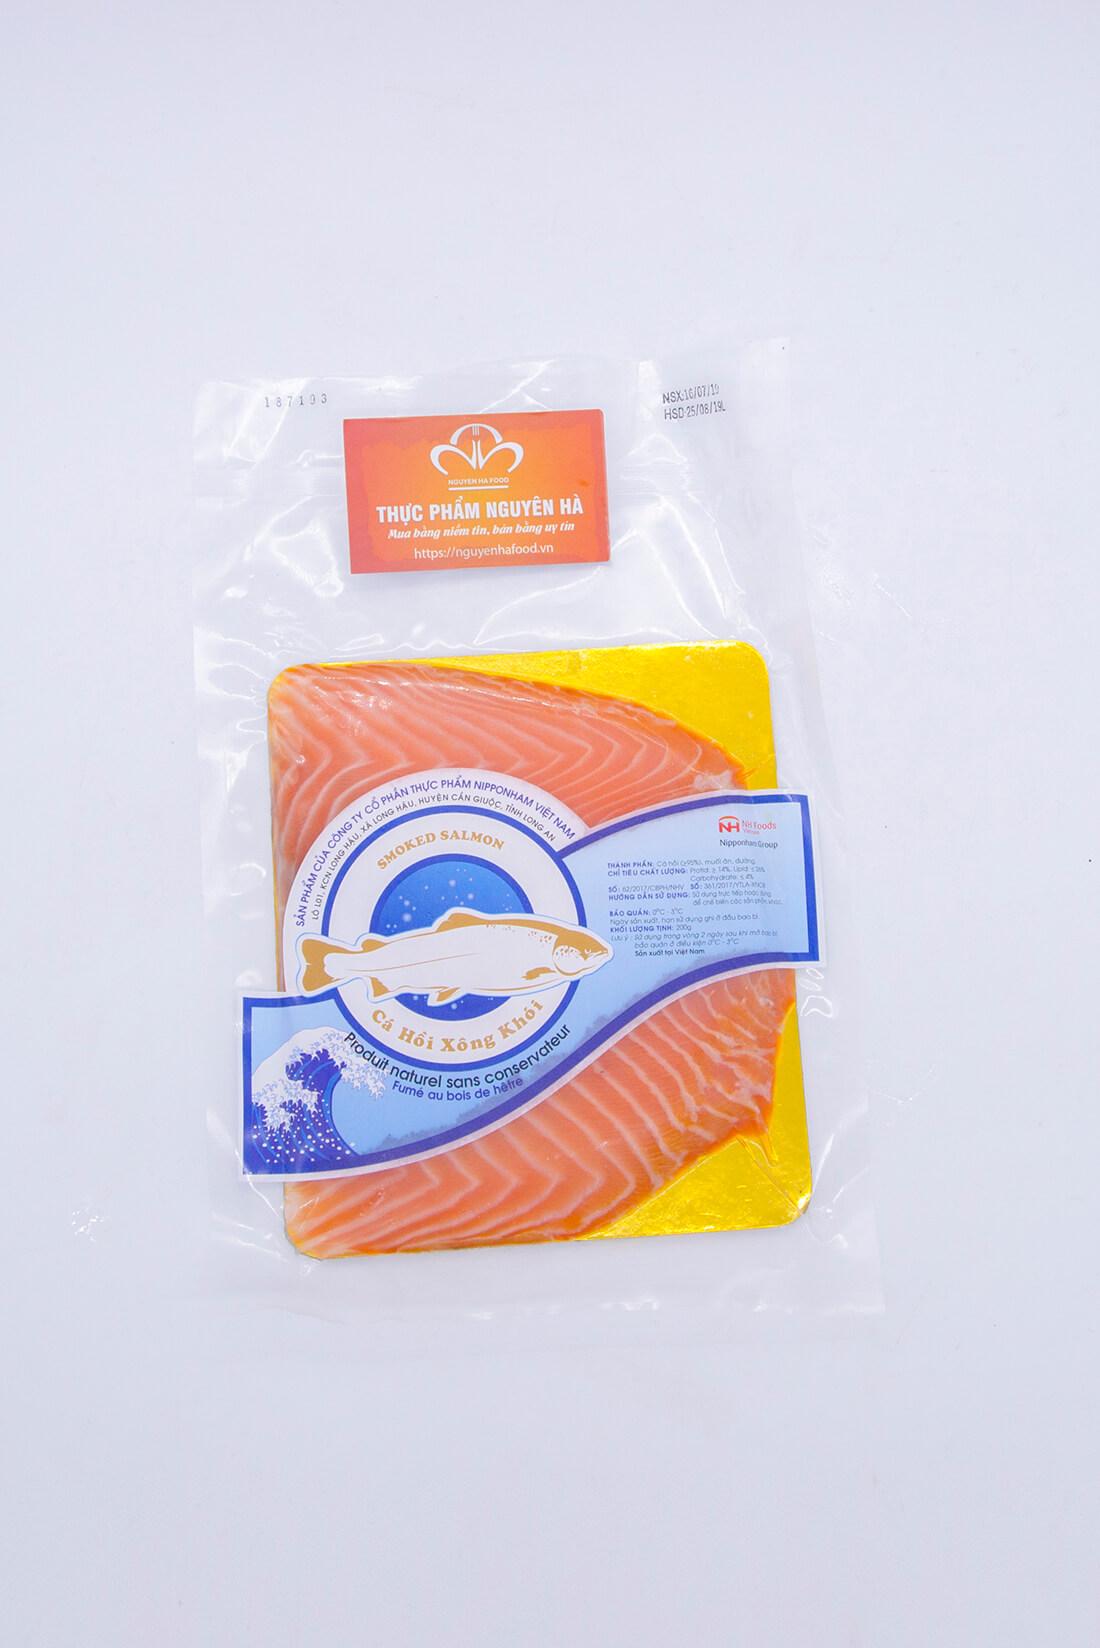 thit-ca-hoi-xong-khoi-cat-lat-smoked-salmon-sliced-1